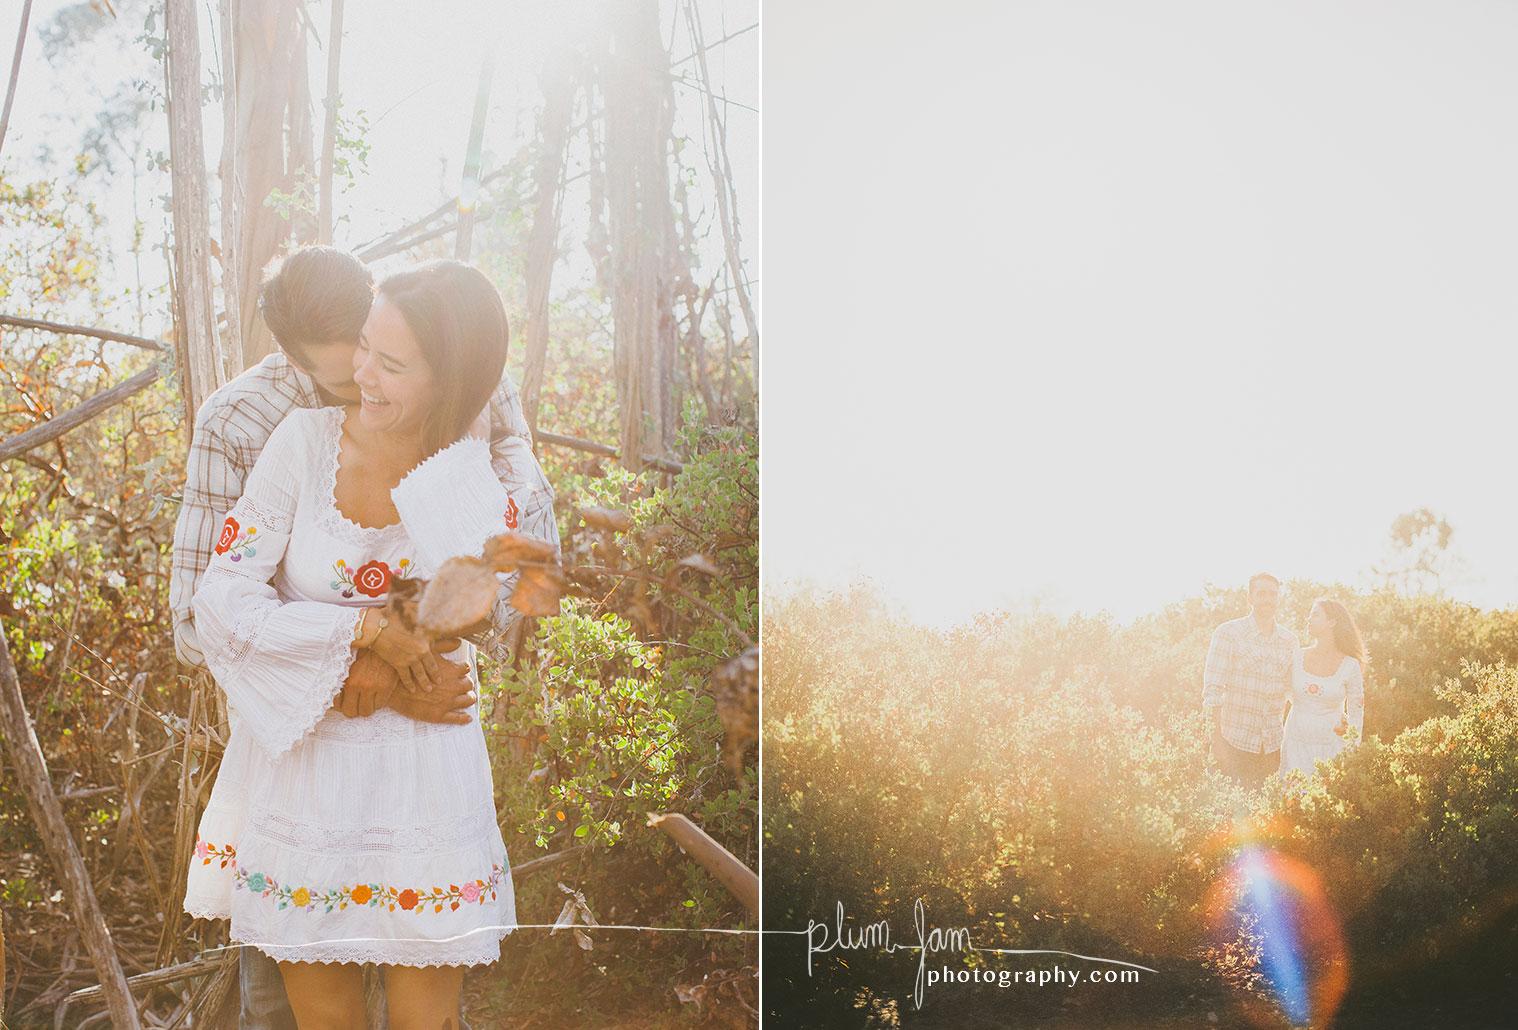 LaurenJustin14-PlumJamPhotography